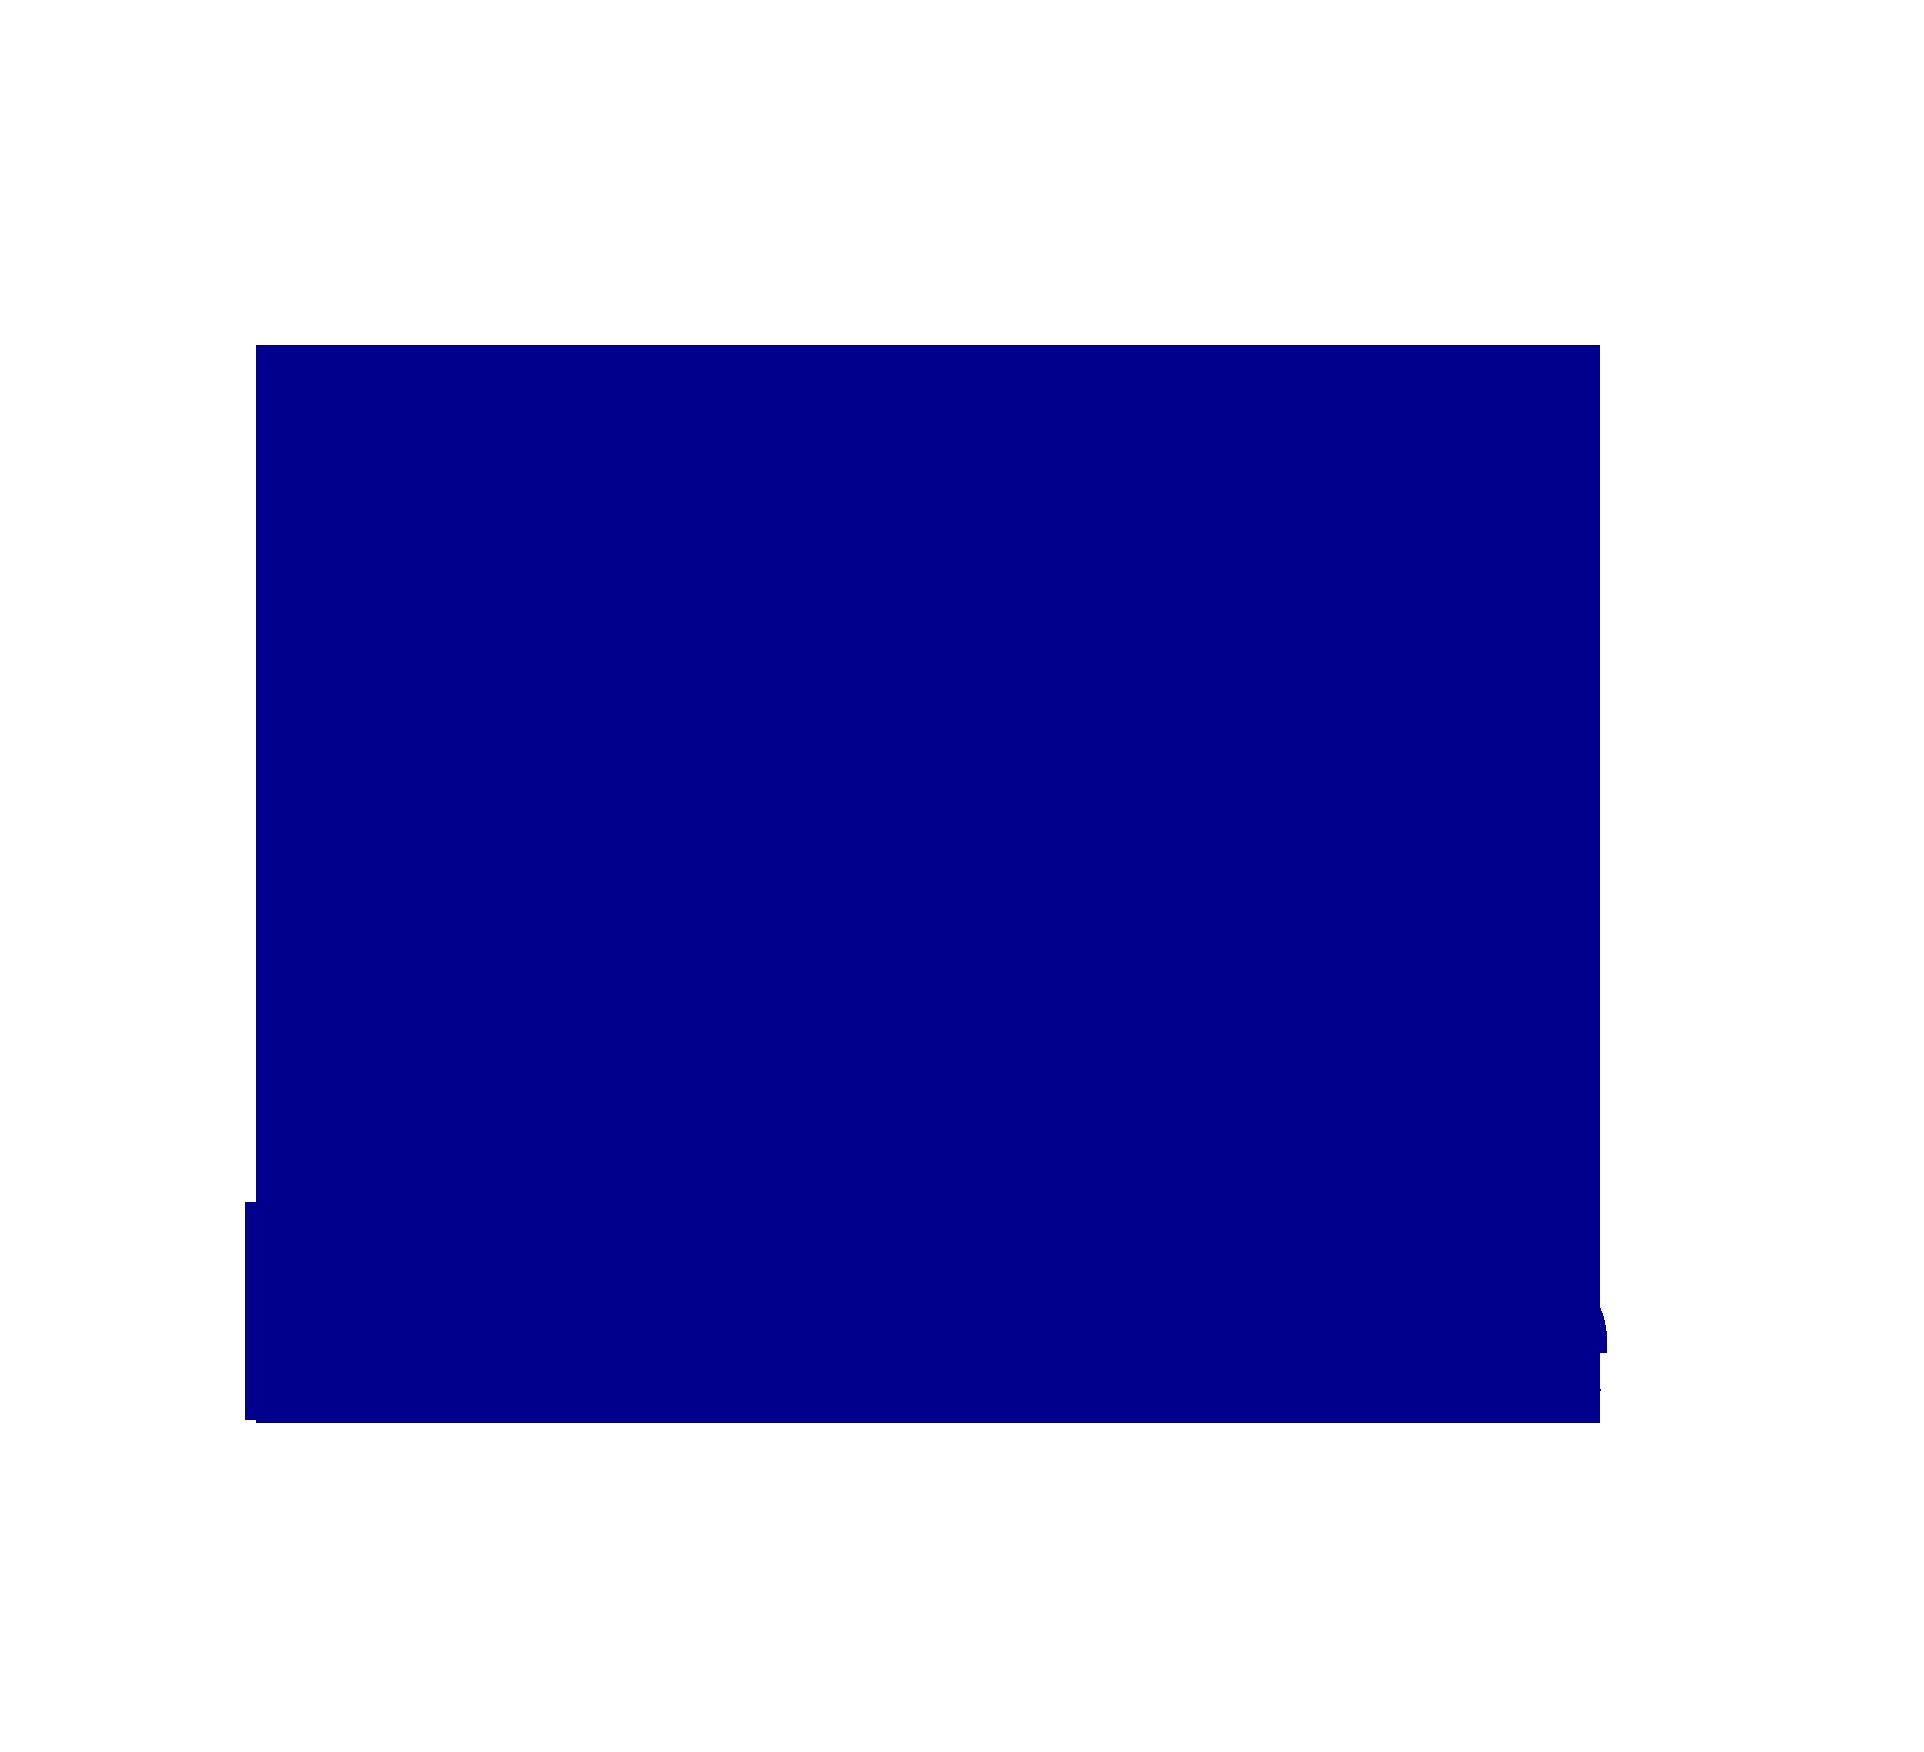 About LTI - About LTI and Newgen Partnership